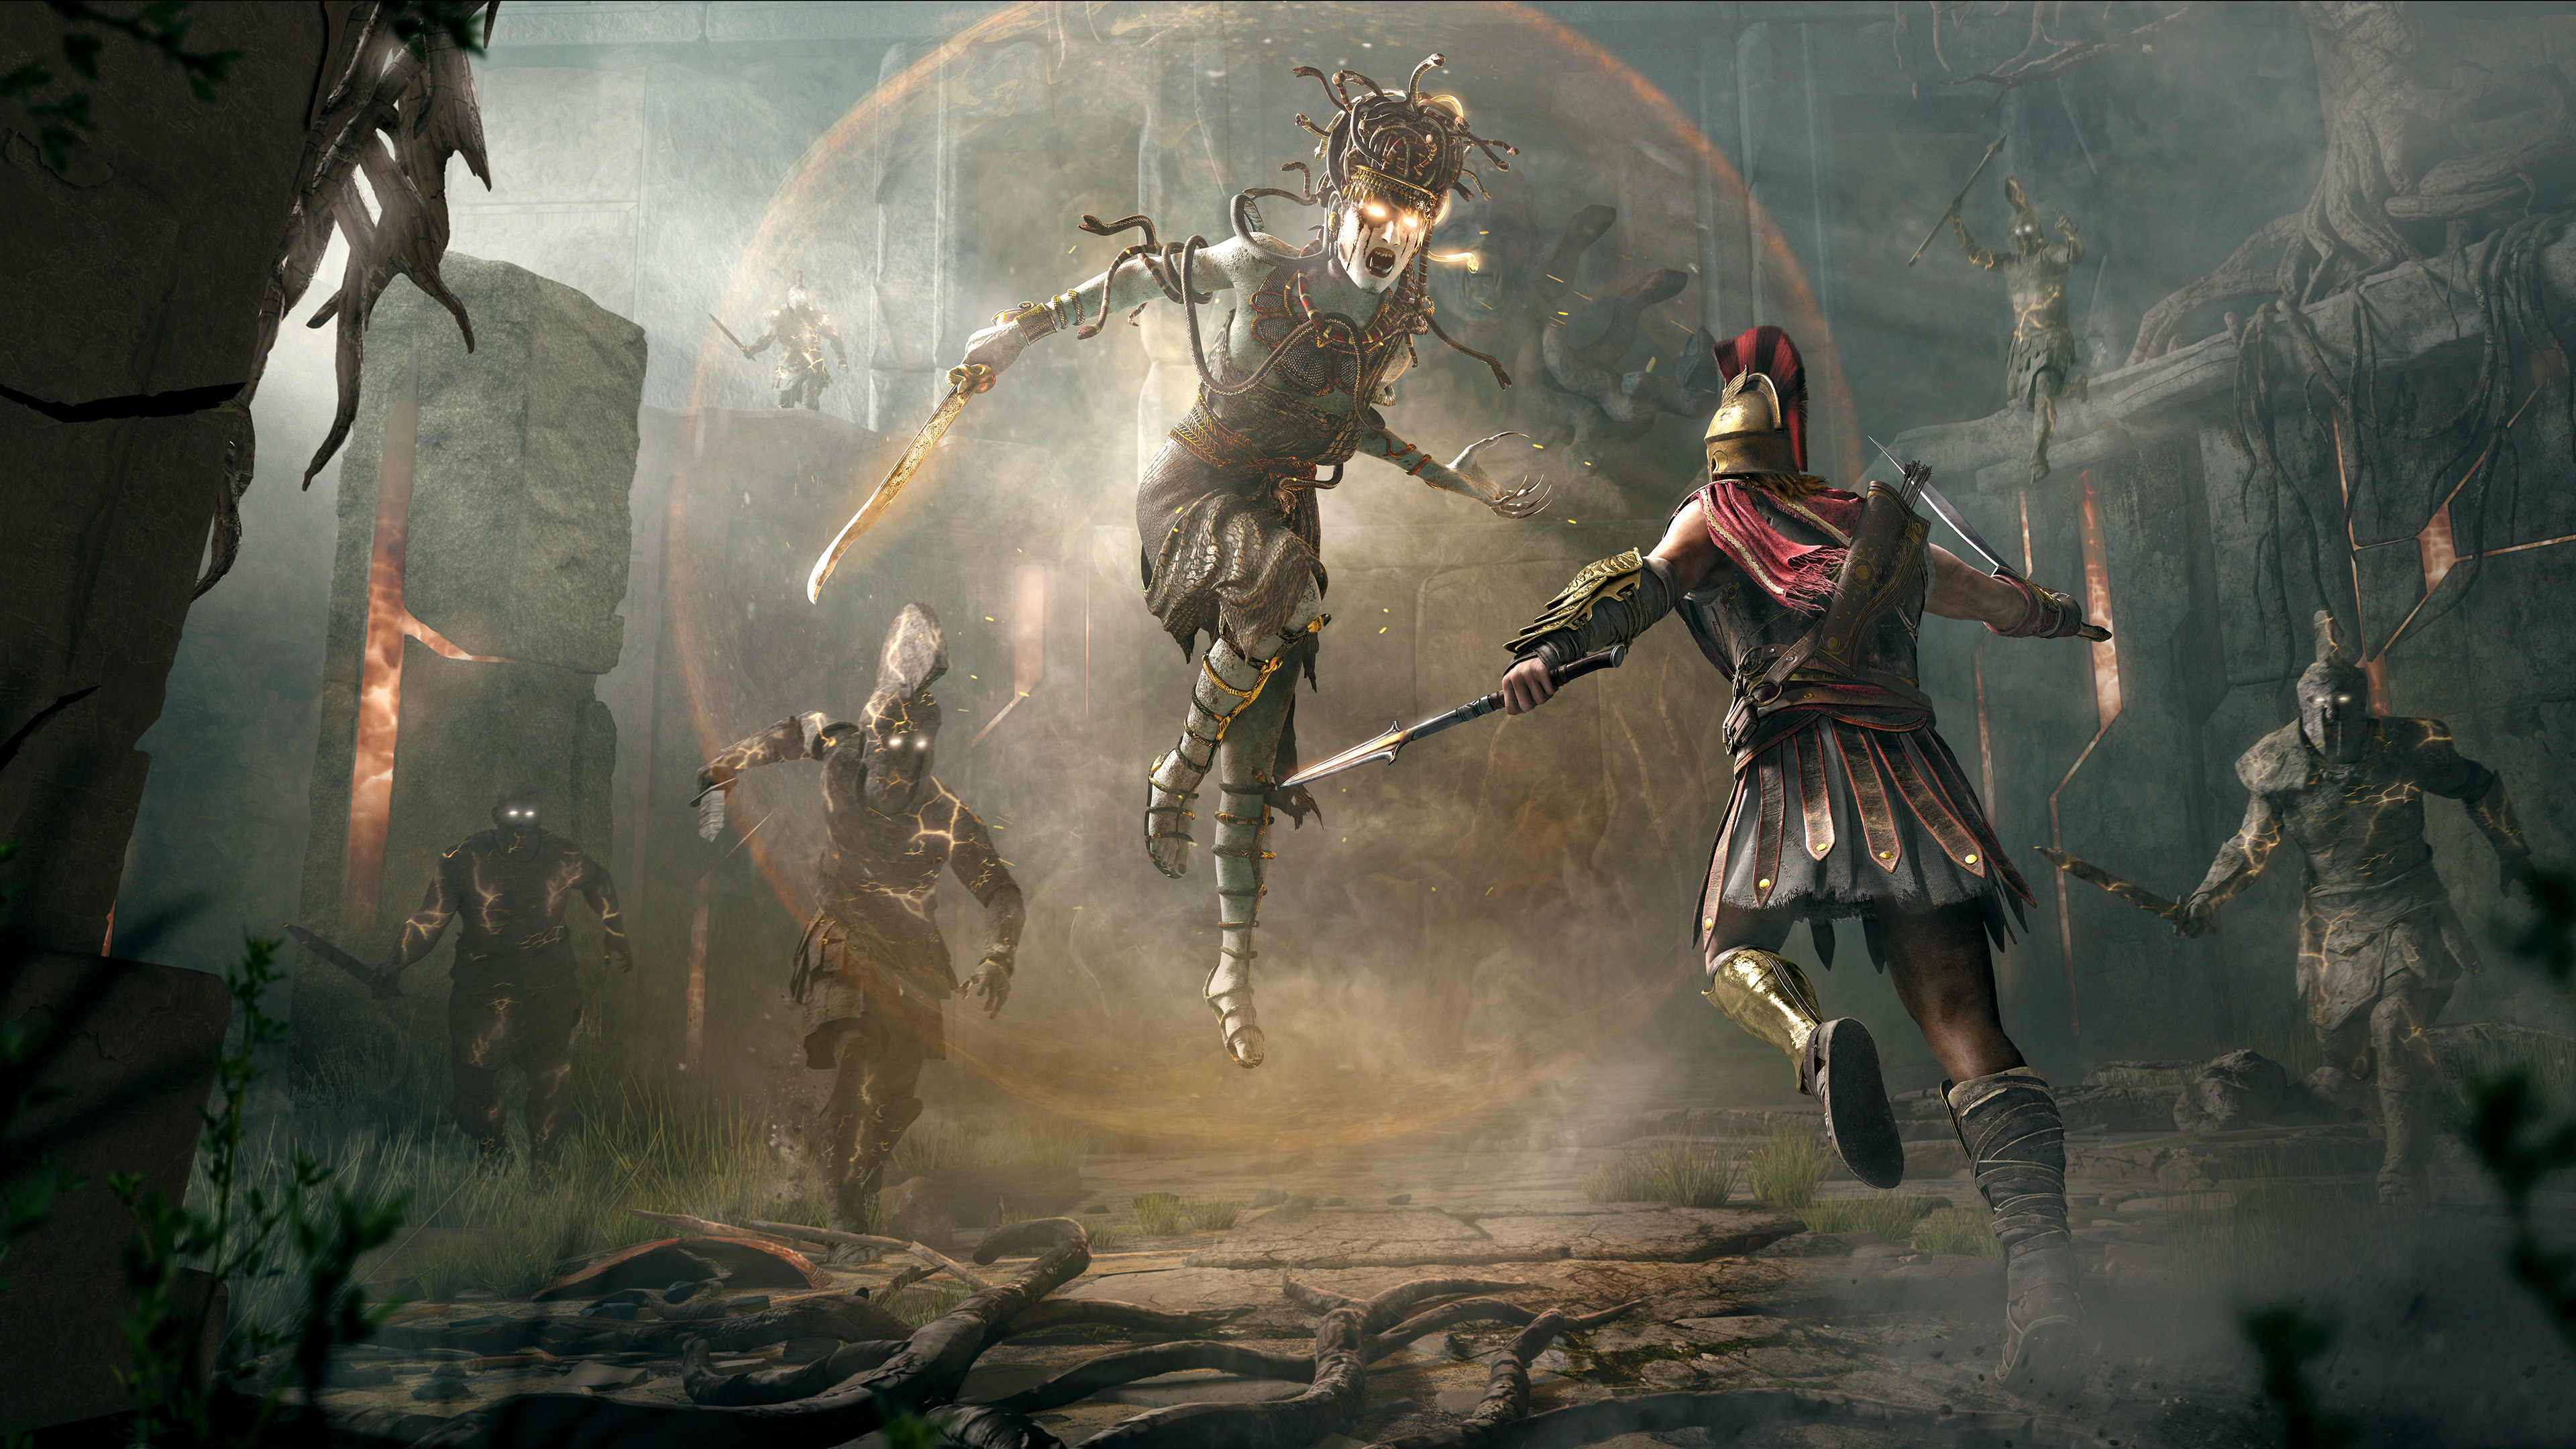 3840x2160 Assassins Creed Odyssey Fight 4k 4k HD 4k ...